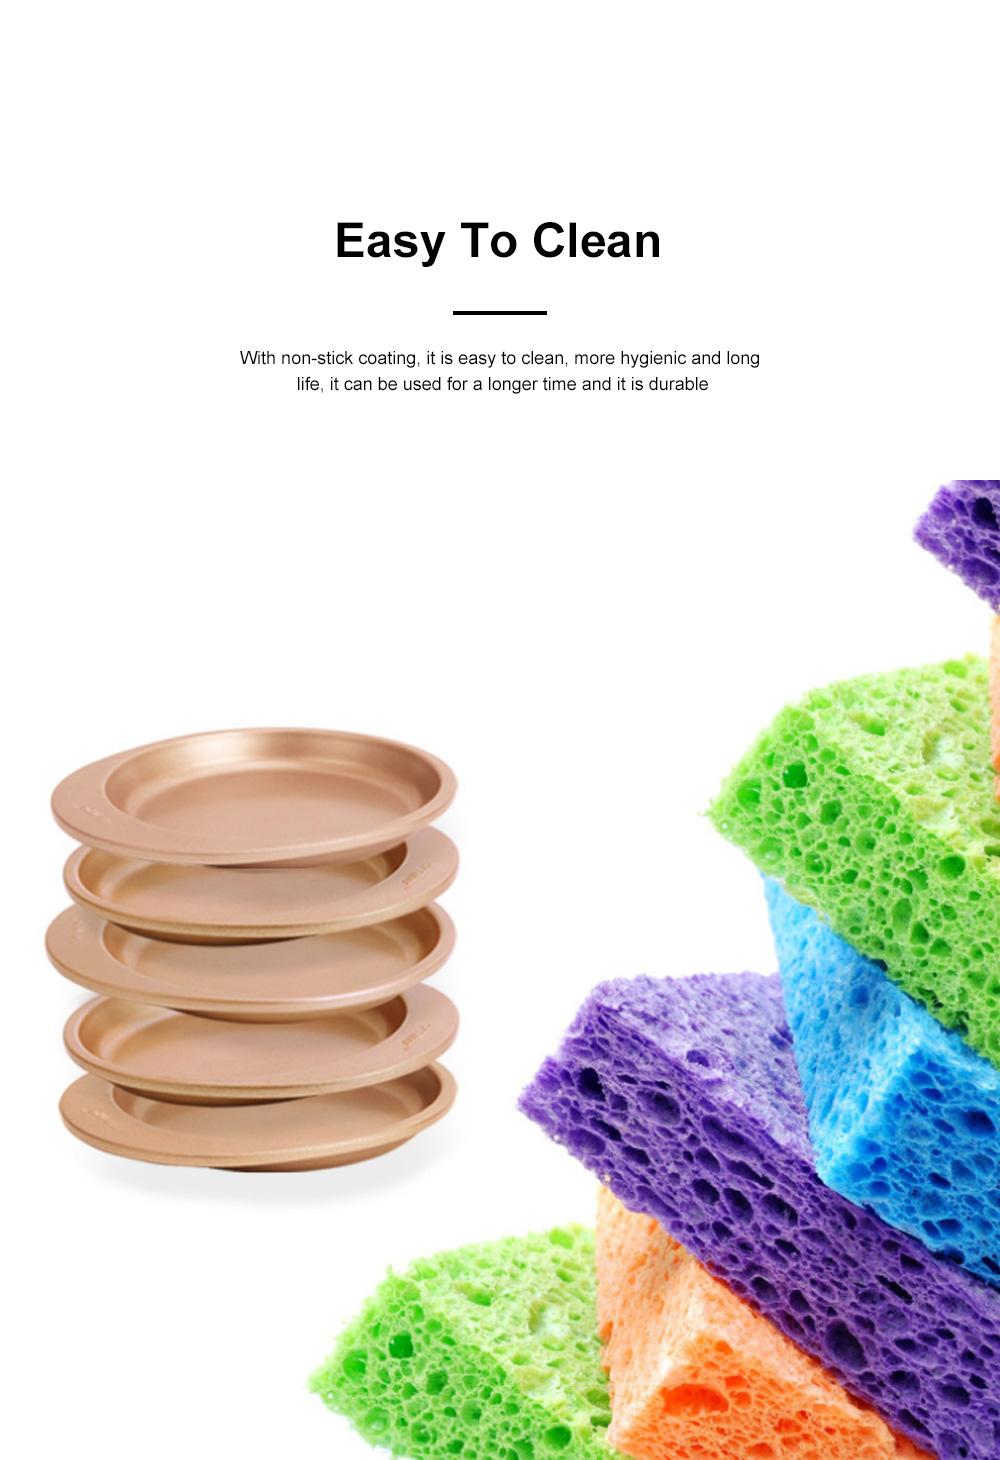 Chefmade Silicone Rainbow Cake Mould Bakeware Round DIY Baking Pan Silicone Cake Pans For Baking 5pcs 3